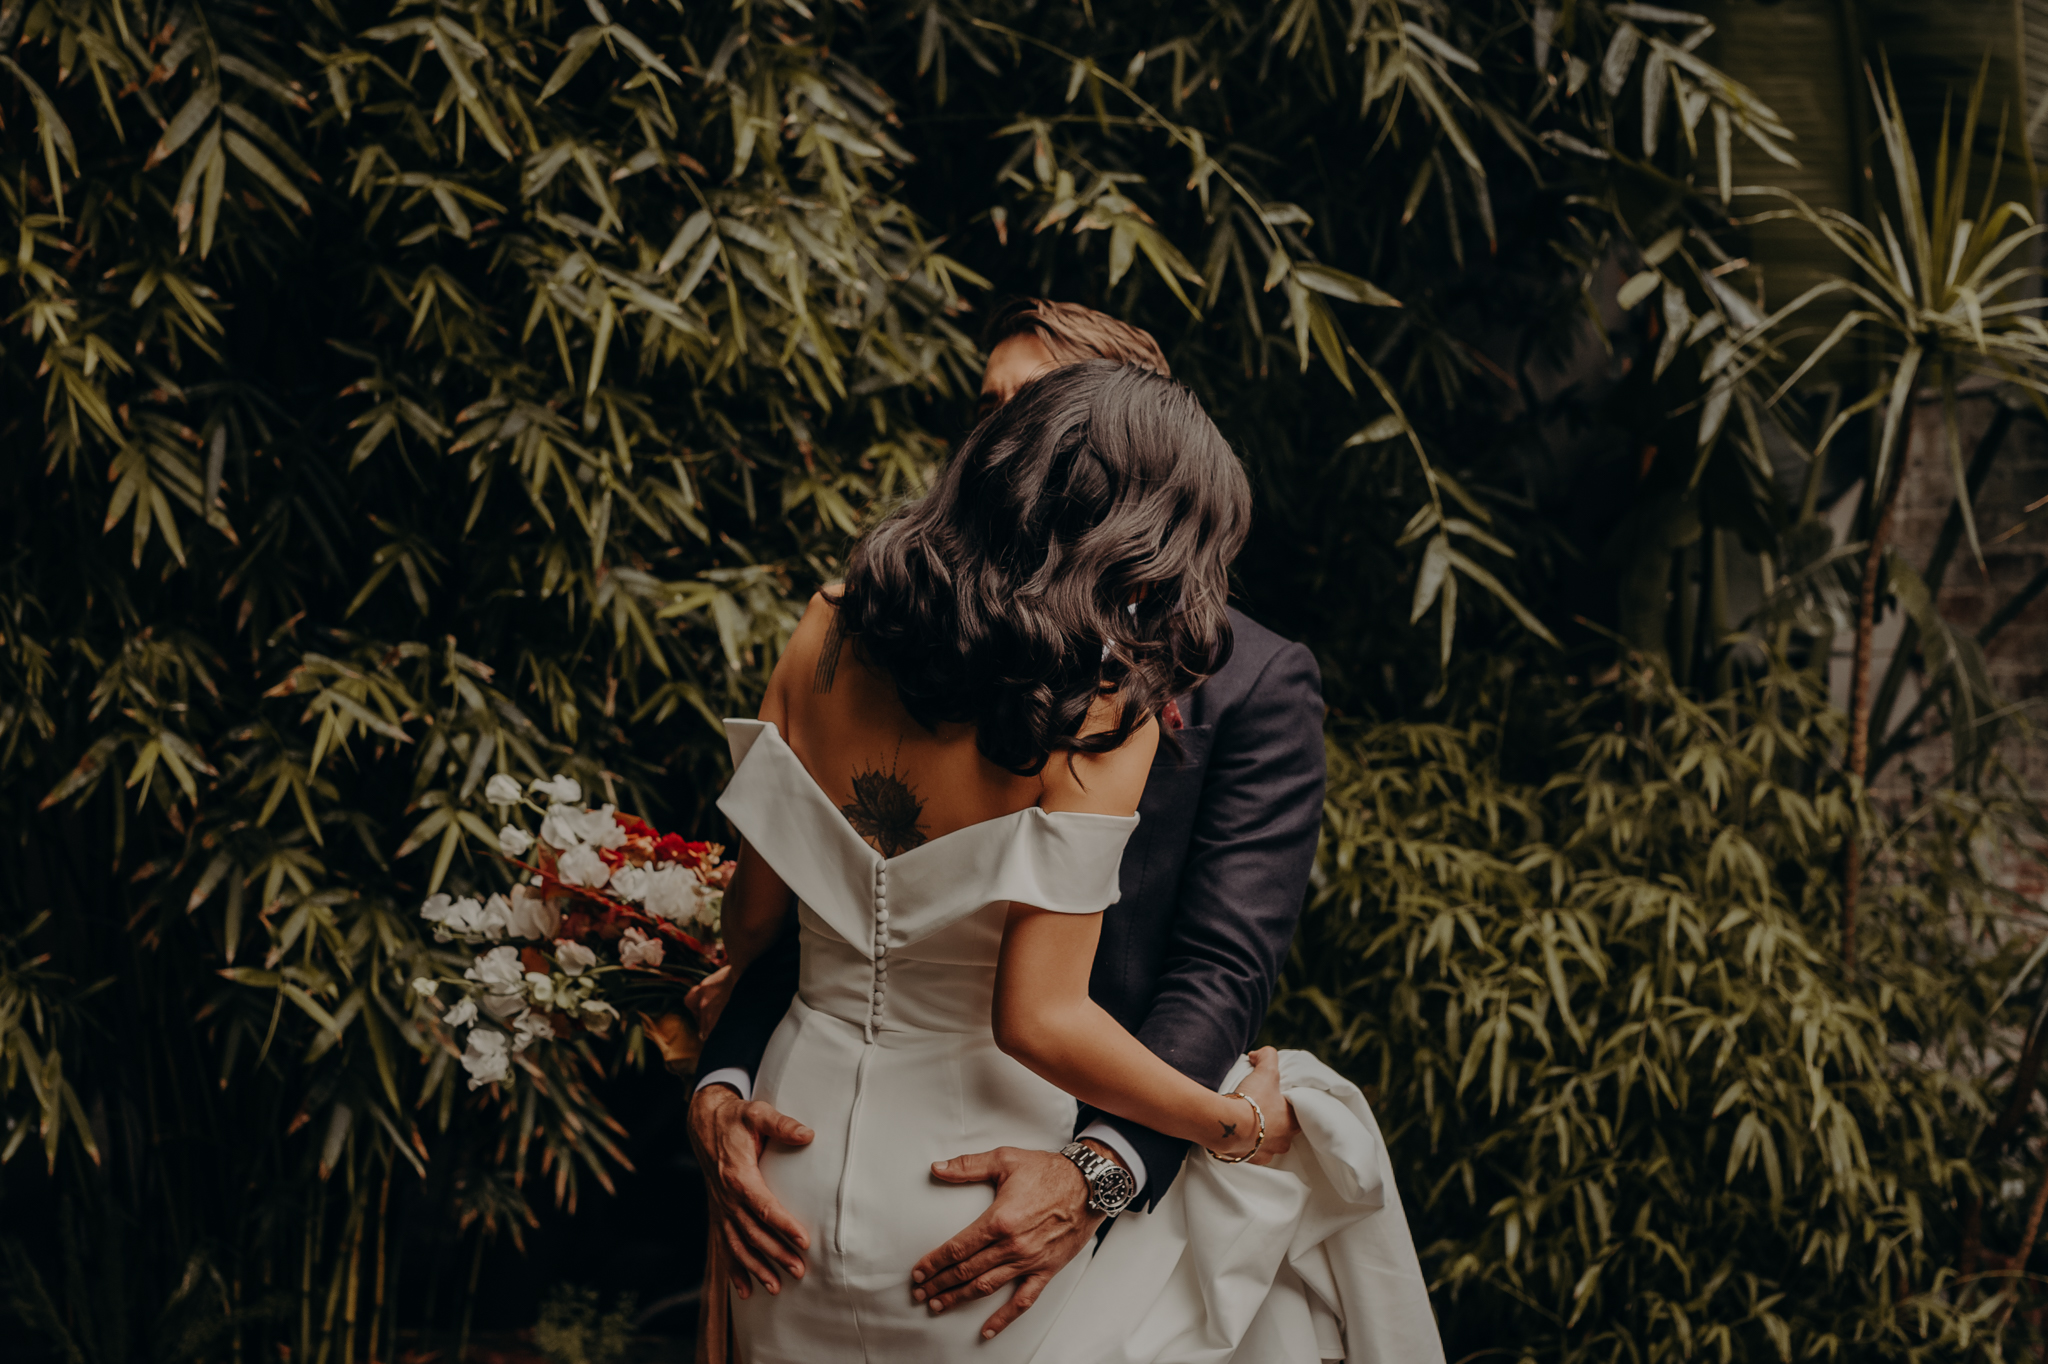 Wedding Photo LA - wedding photographer in los angeles - millwick wedding venue -isaiahandtaylor.com-050.jpg